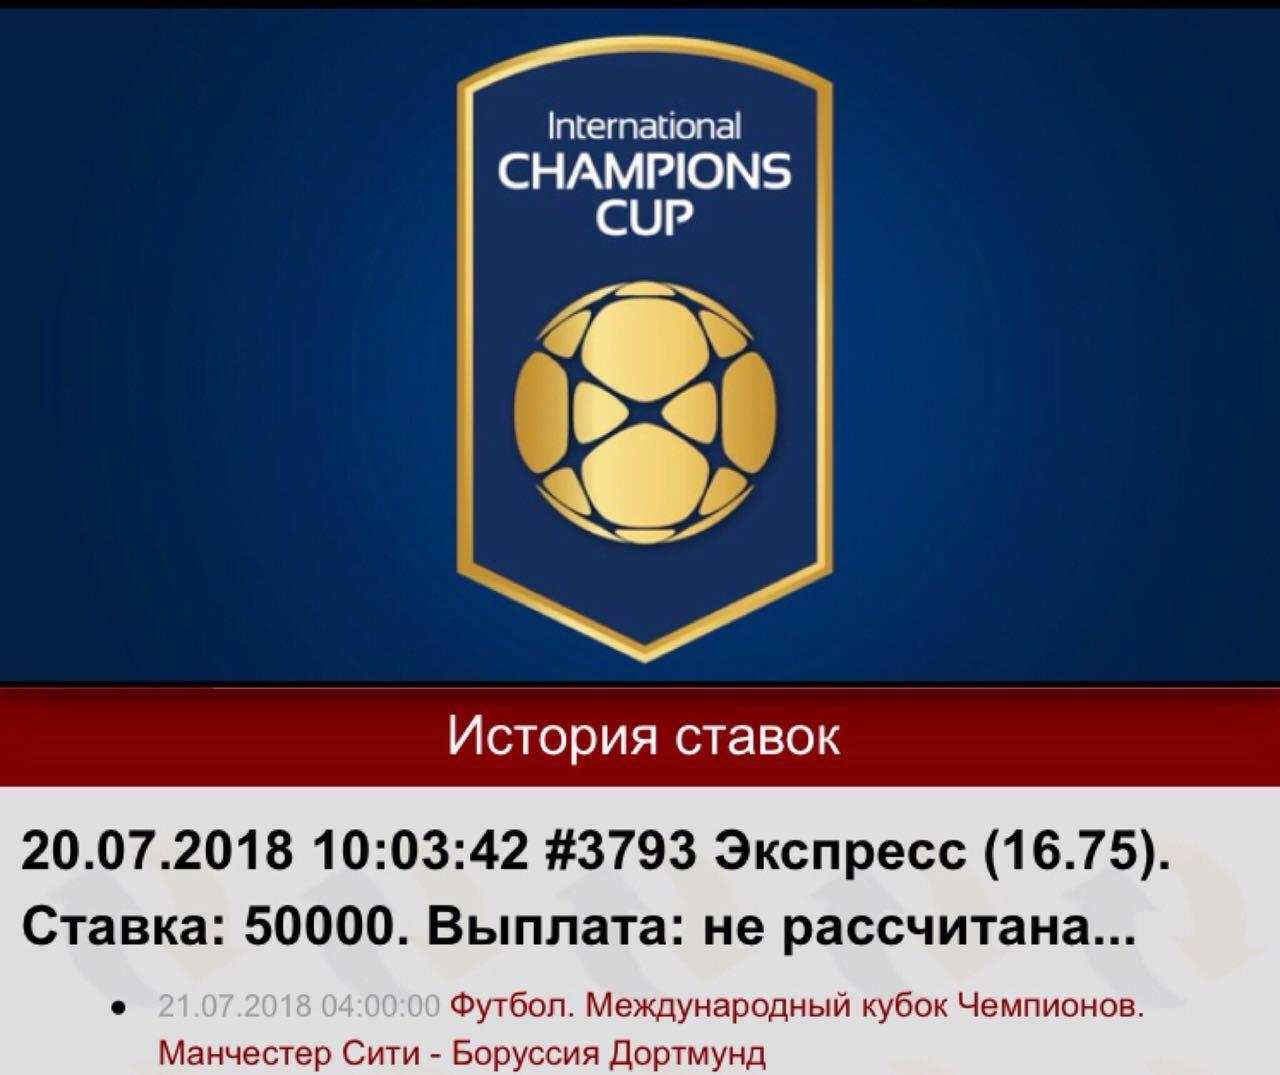 Ставки на спорт каппер ставки транспортного налога ленинградская область 2011